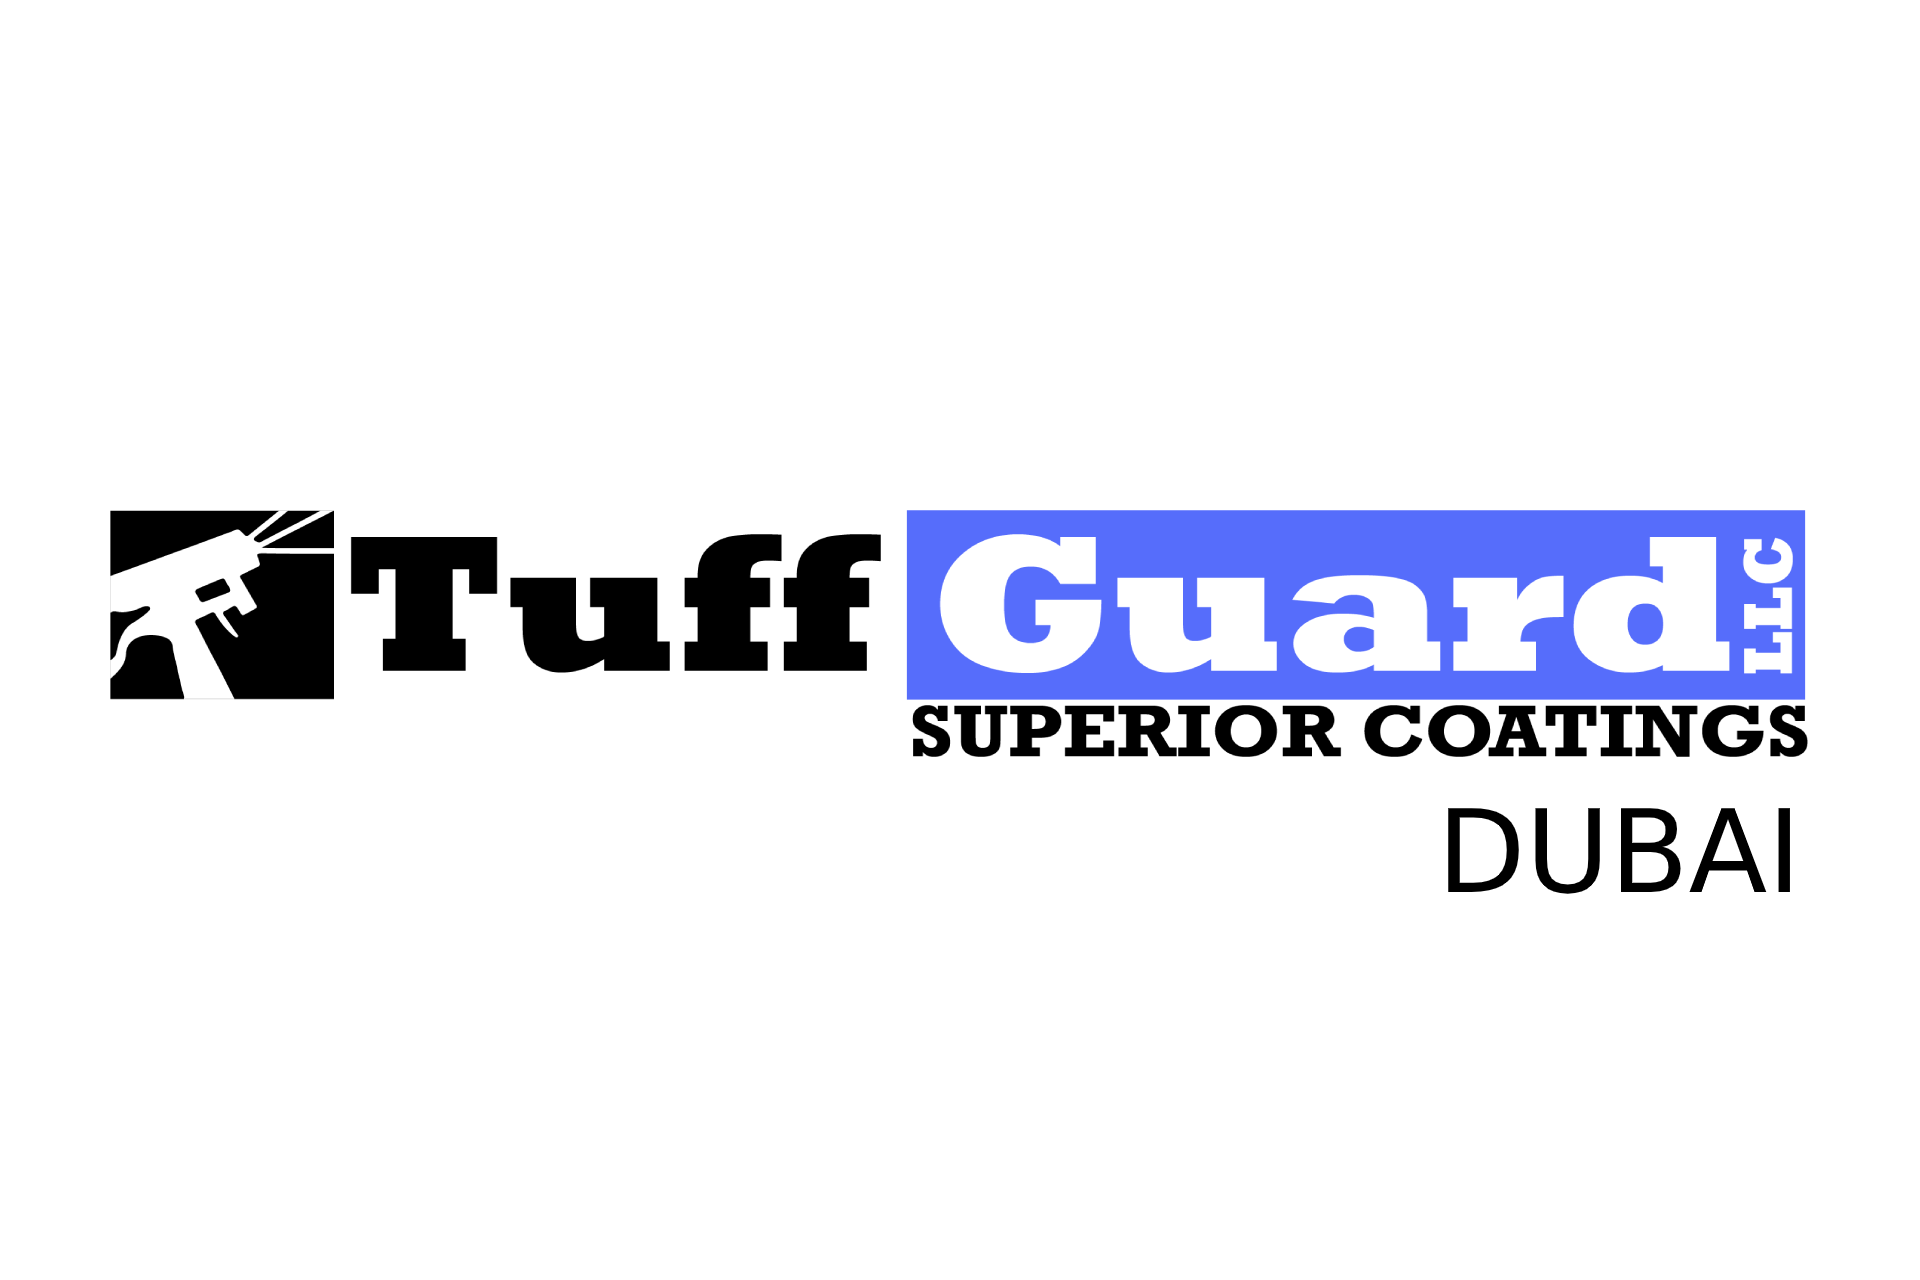 Tuffguard